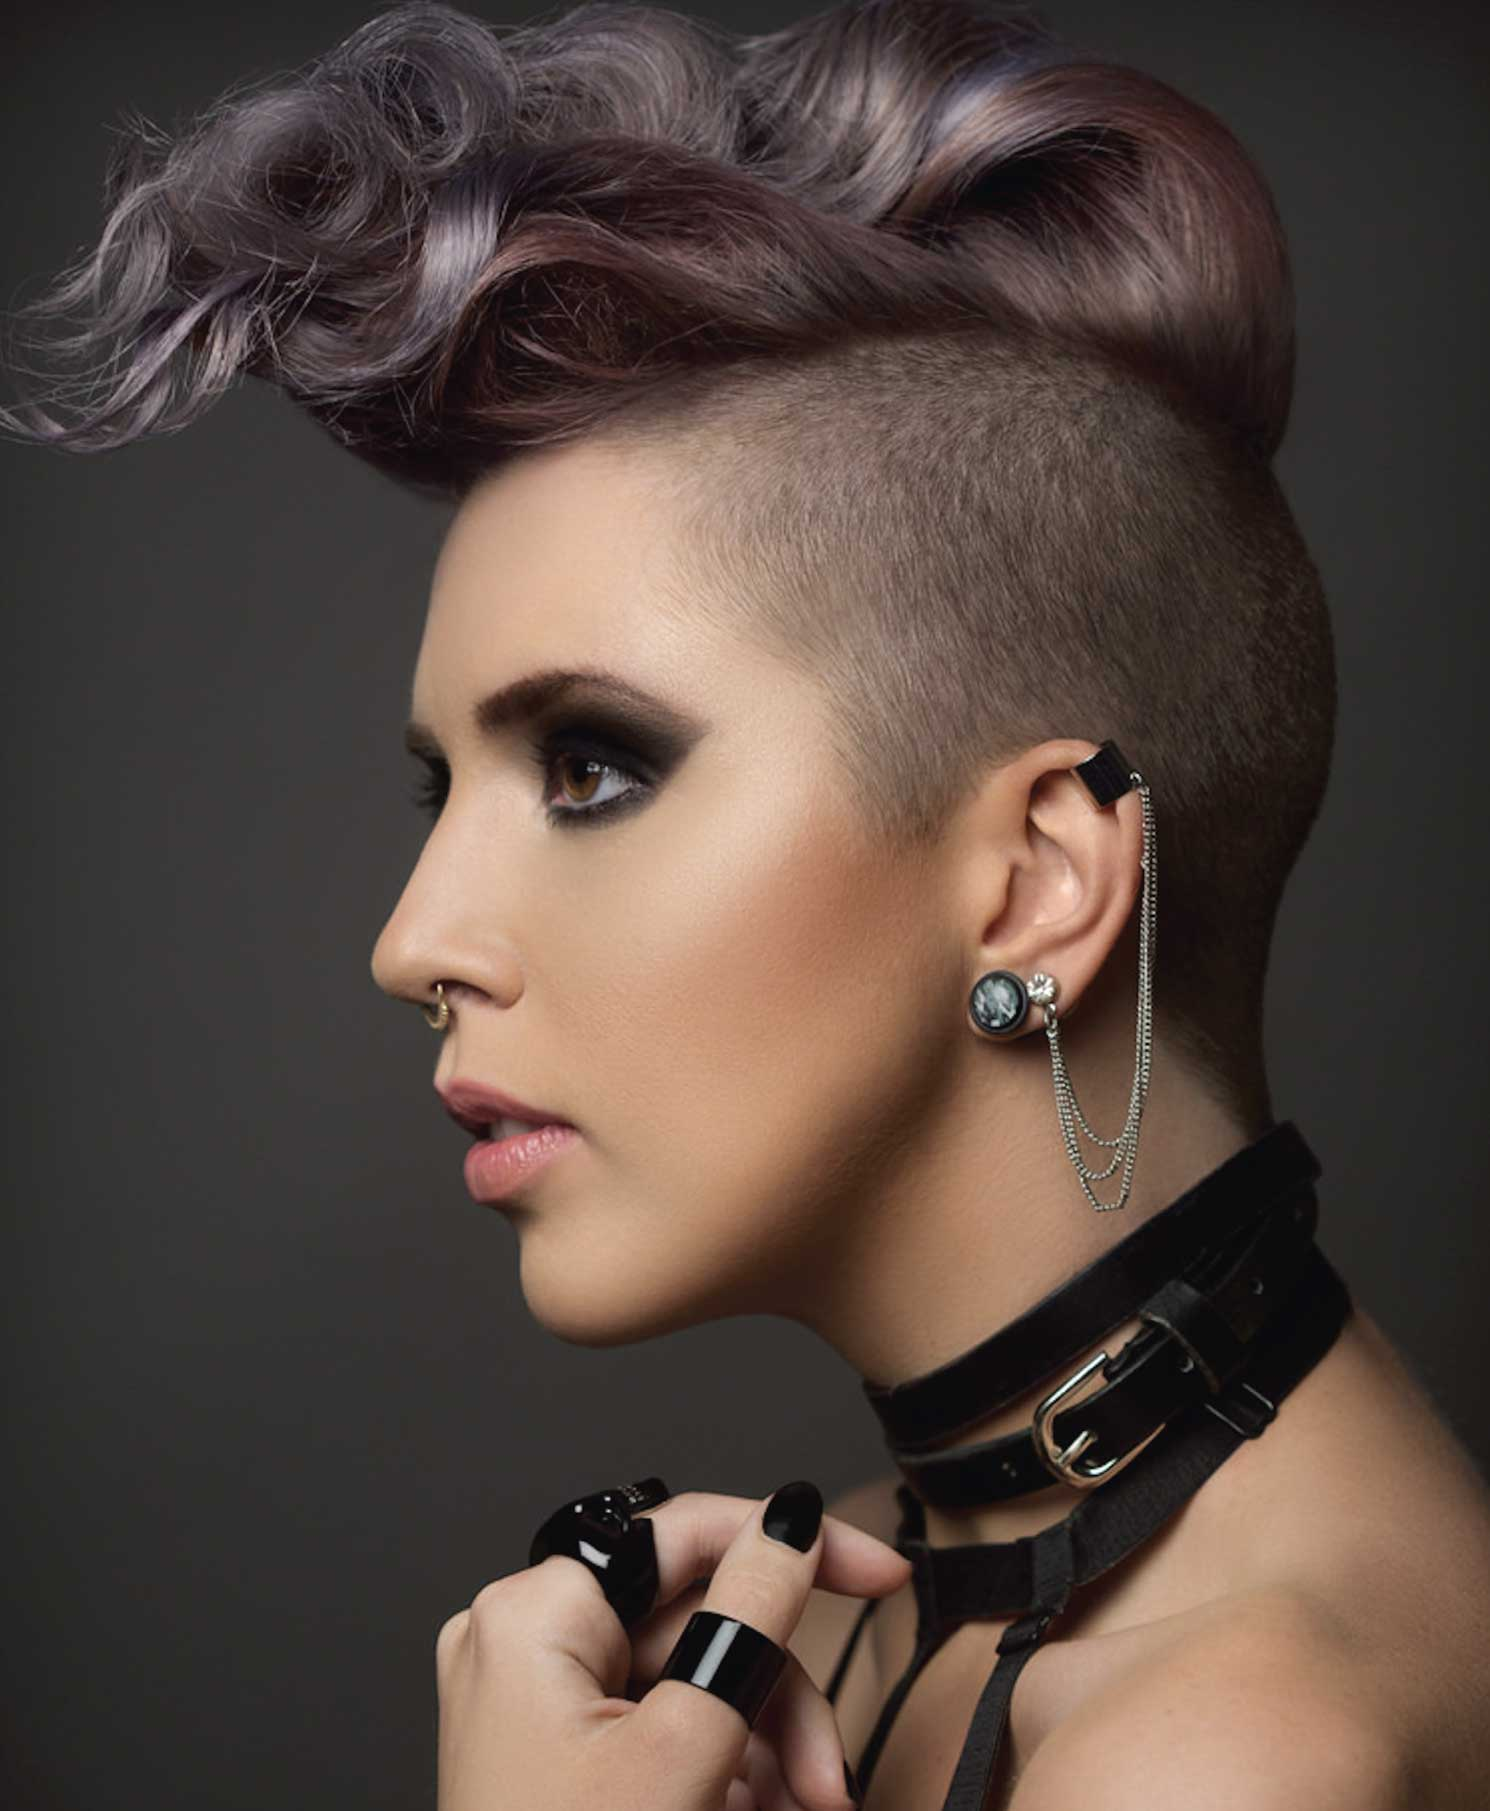 Hair Expo Awards 2015